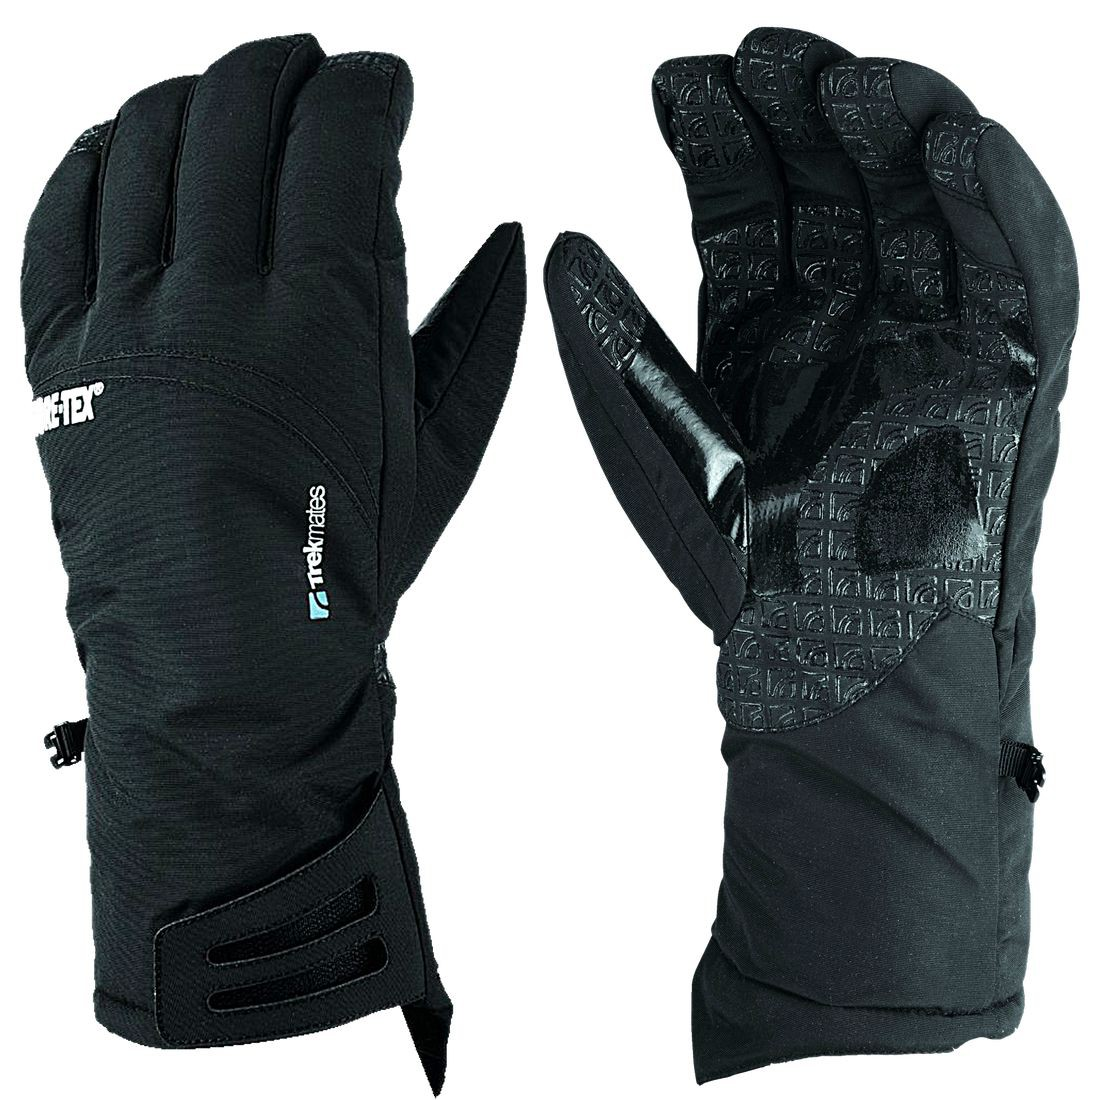 Camping & Outdoor Trekmates Skiddaw L Damen Fingerhandschuh Gore-Tex Handschuh warm wasserdicht Handschuhe